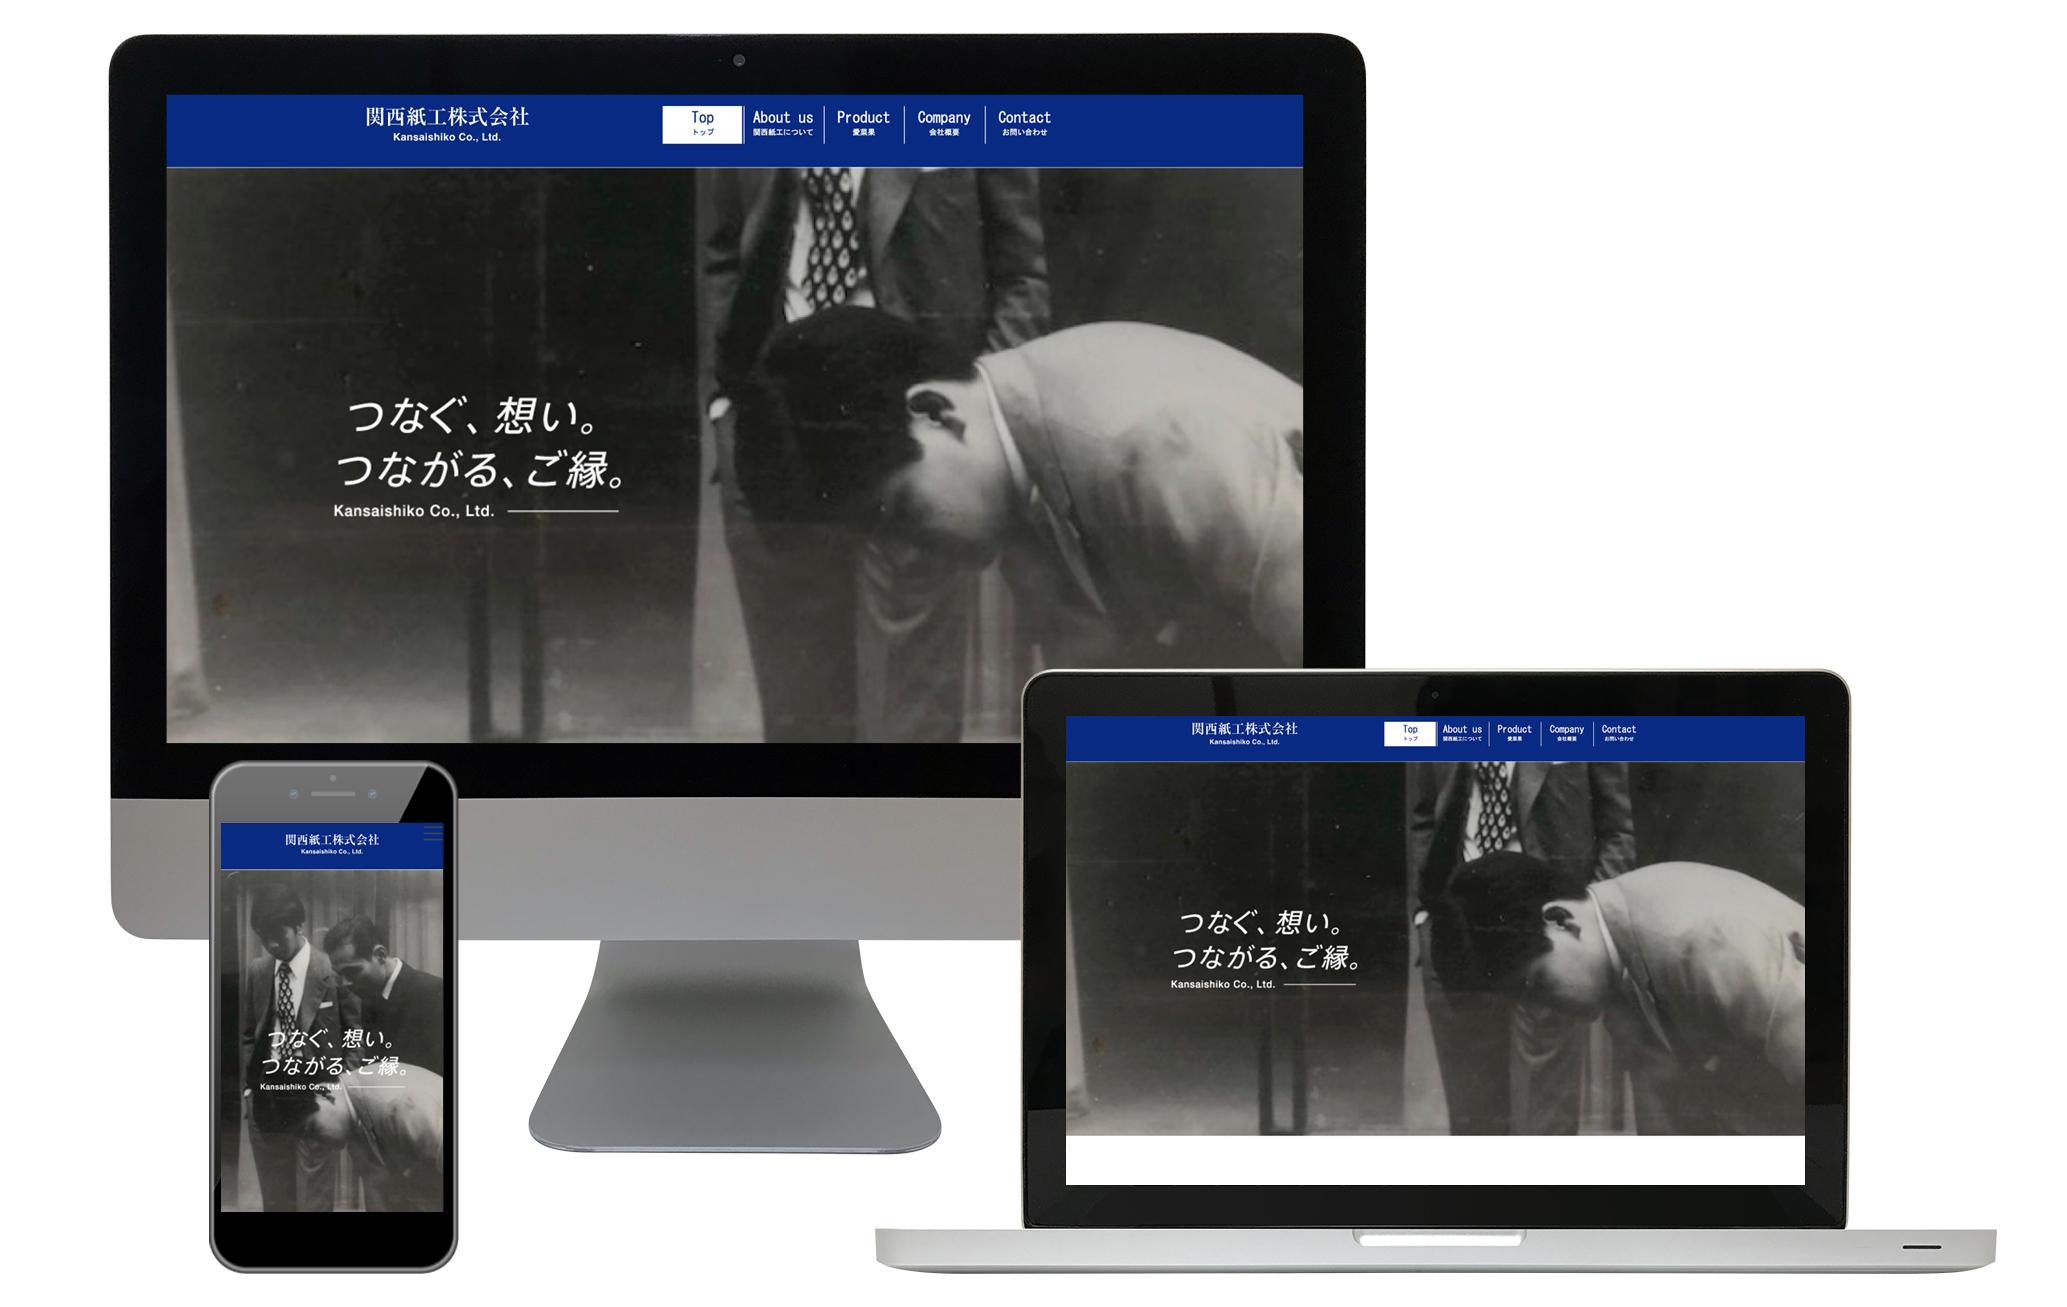 Kansai_Shiko_PCimage_WEB.psd